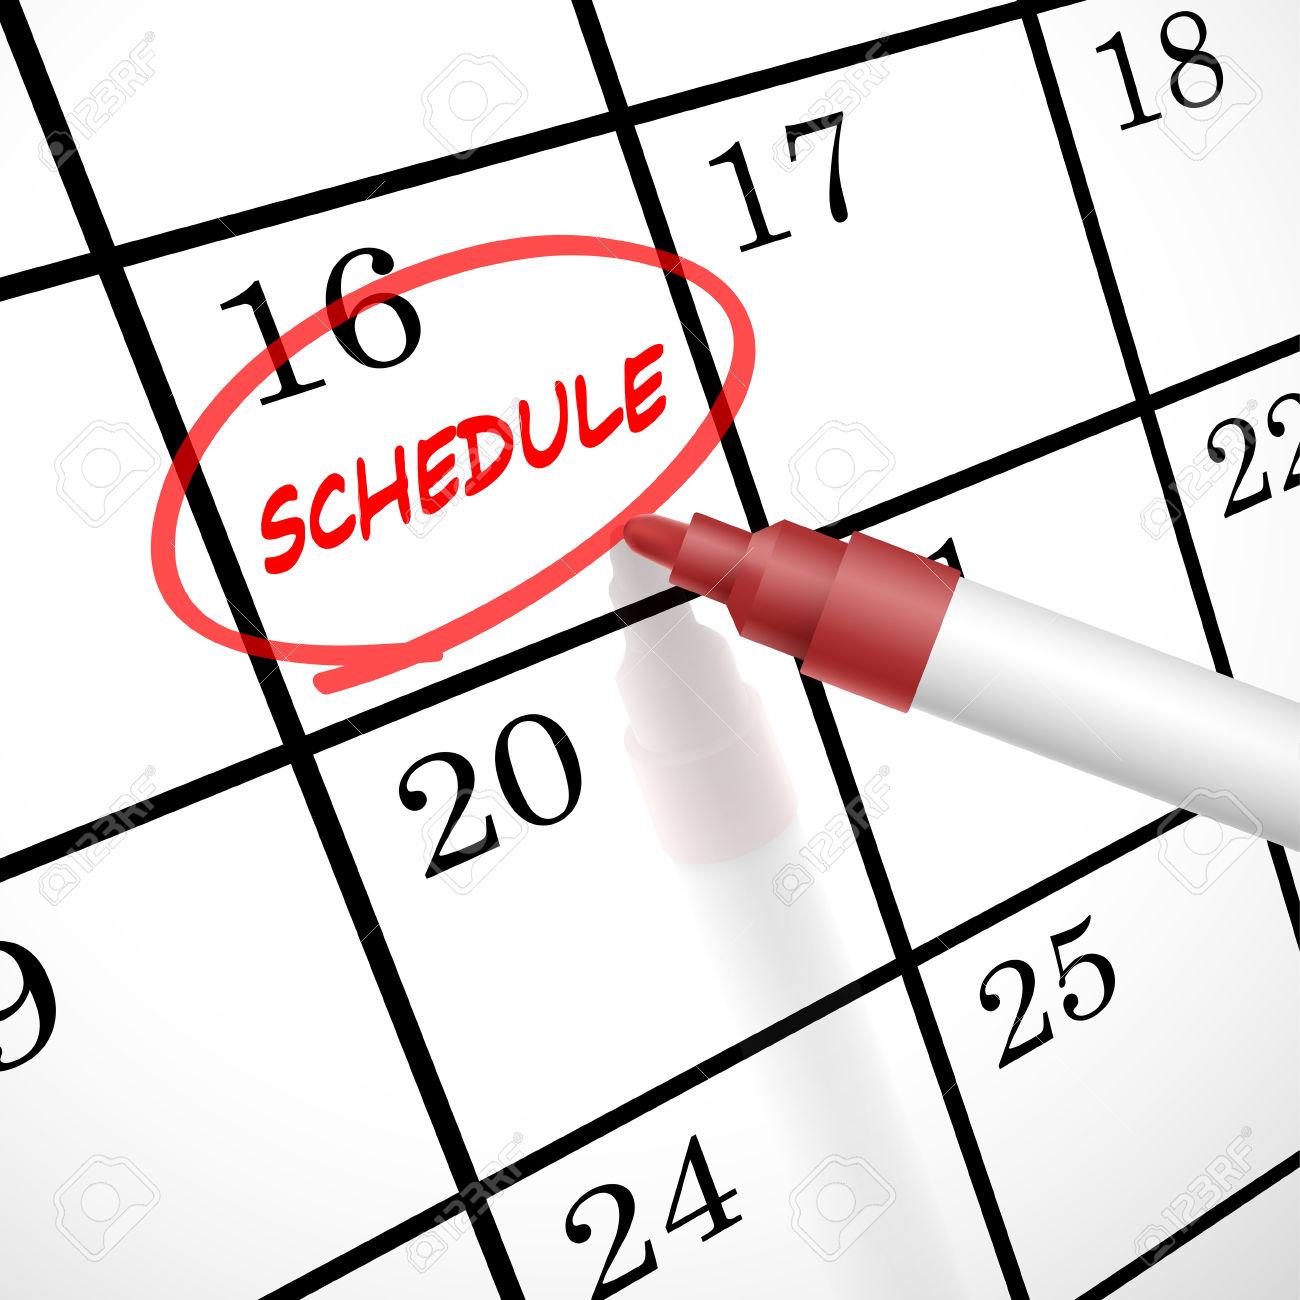 ScheduleCalendar.jpg